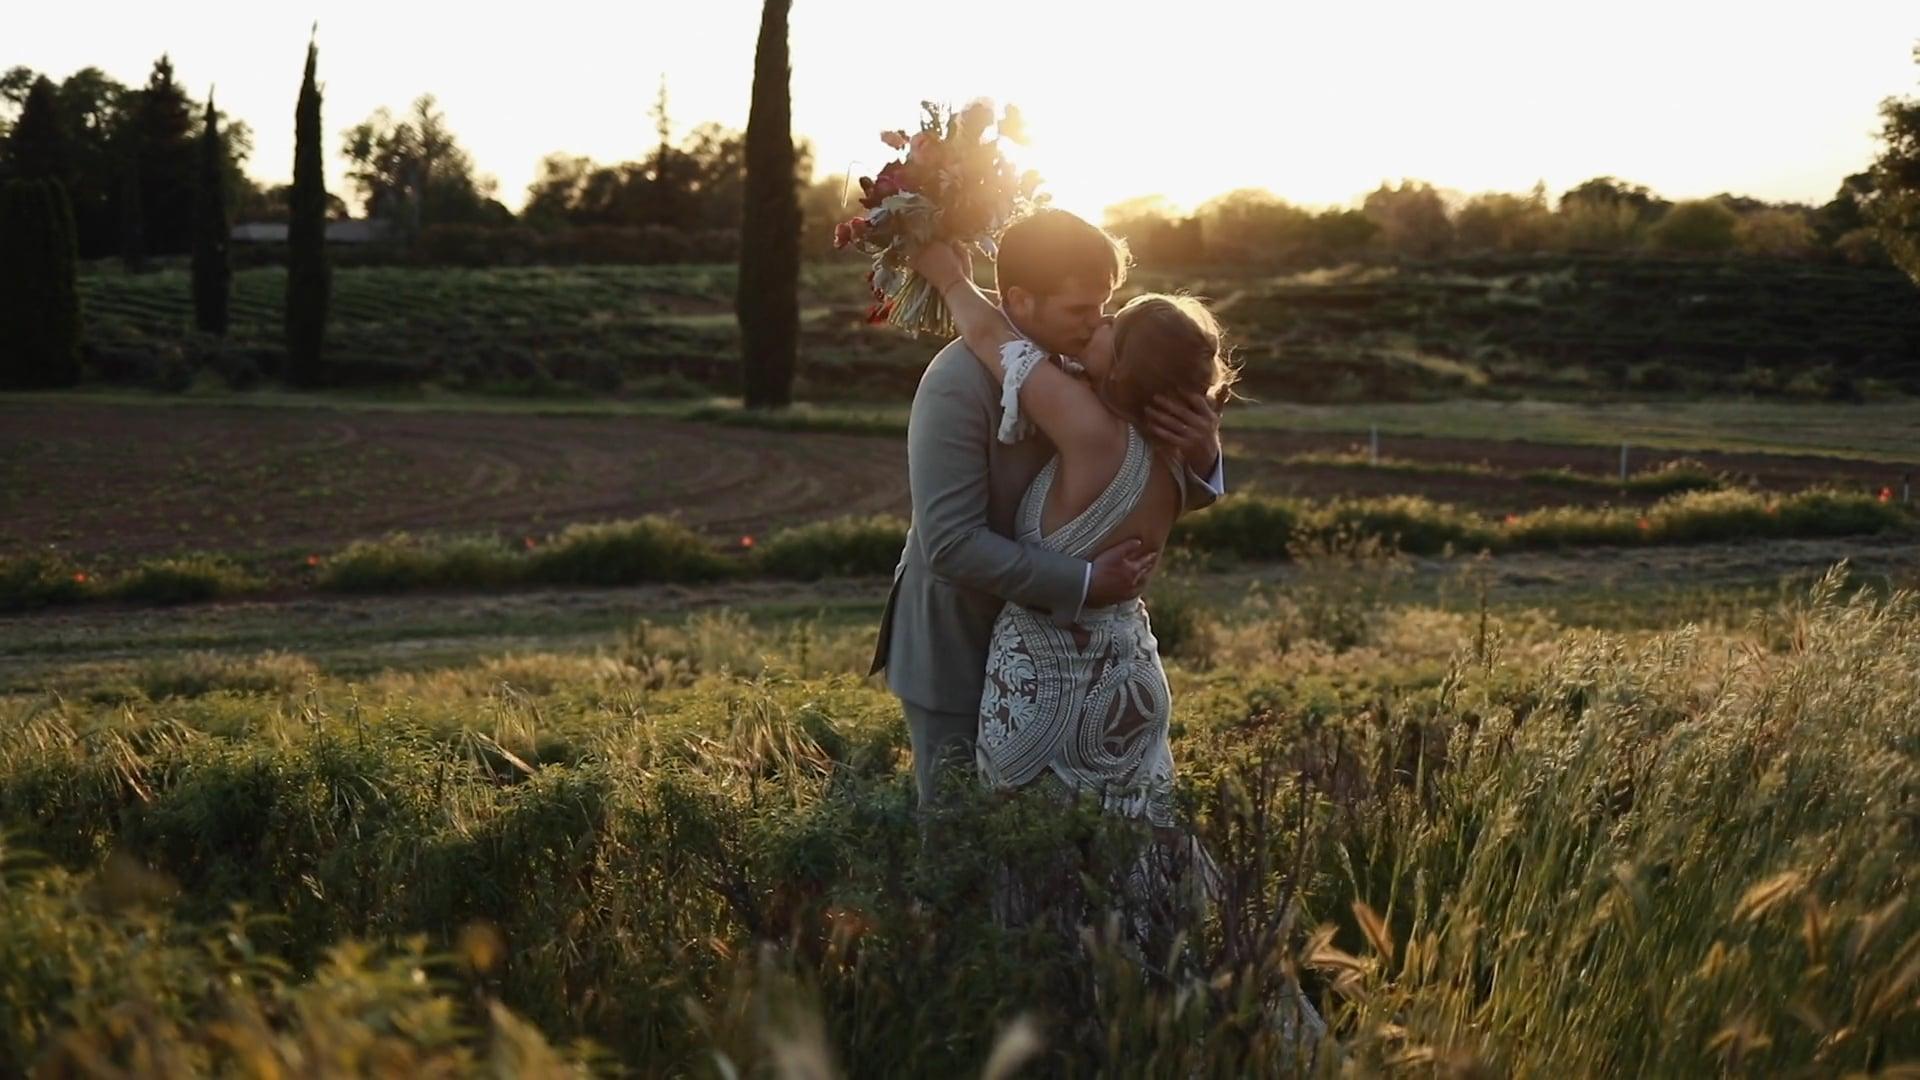 The Wedding of Brittany & Weston